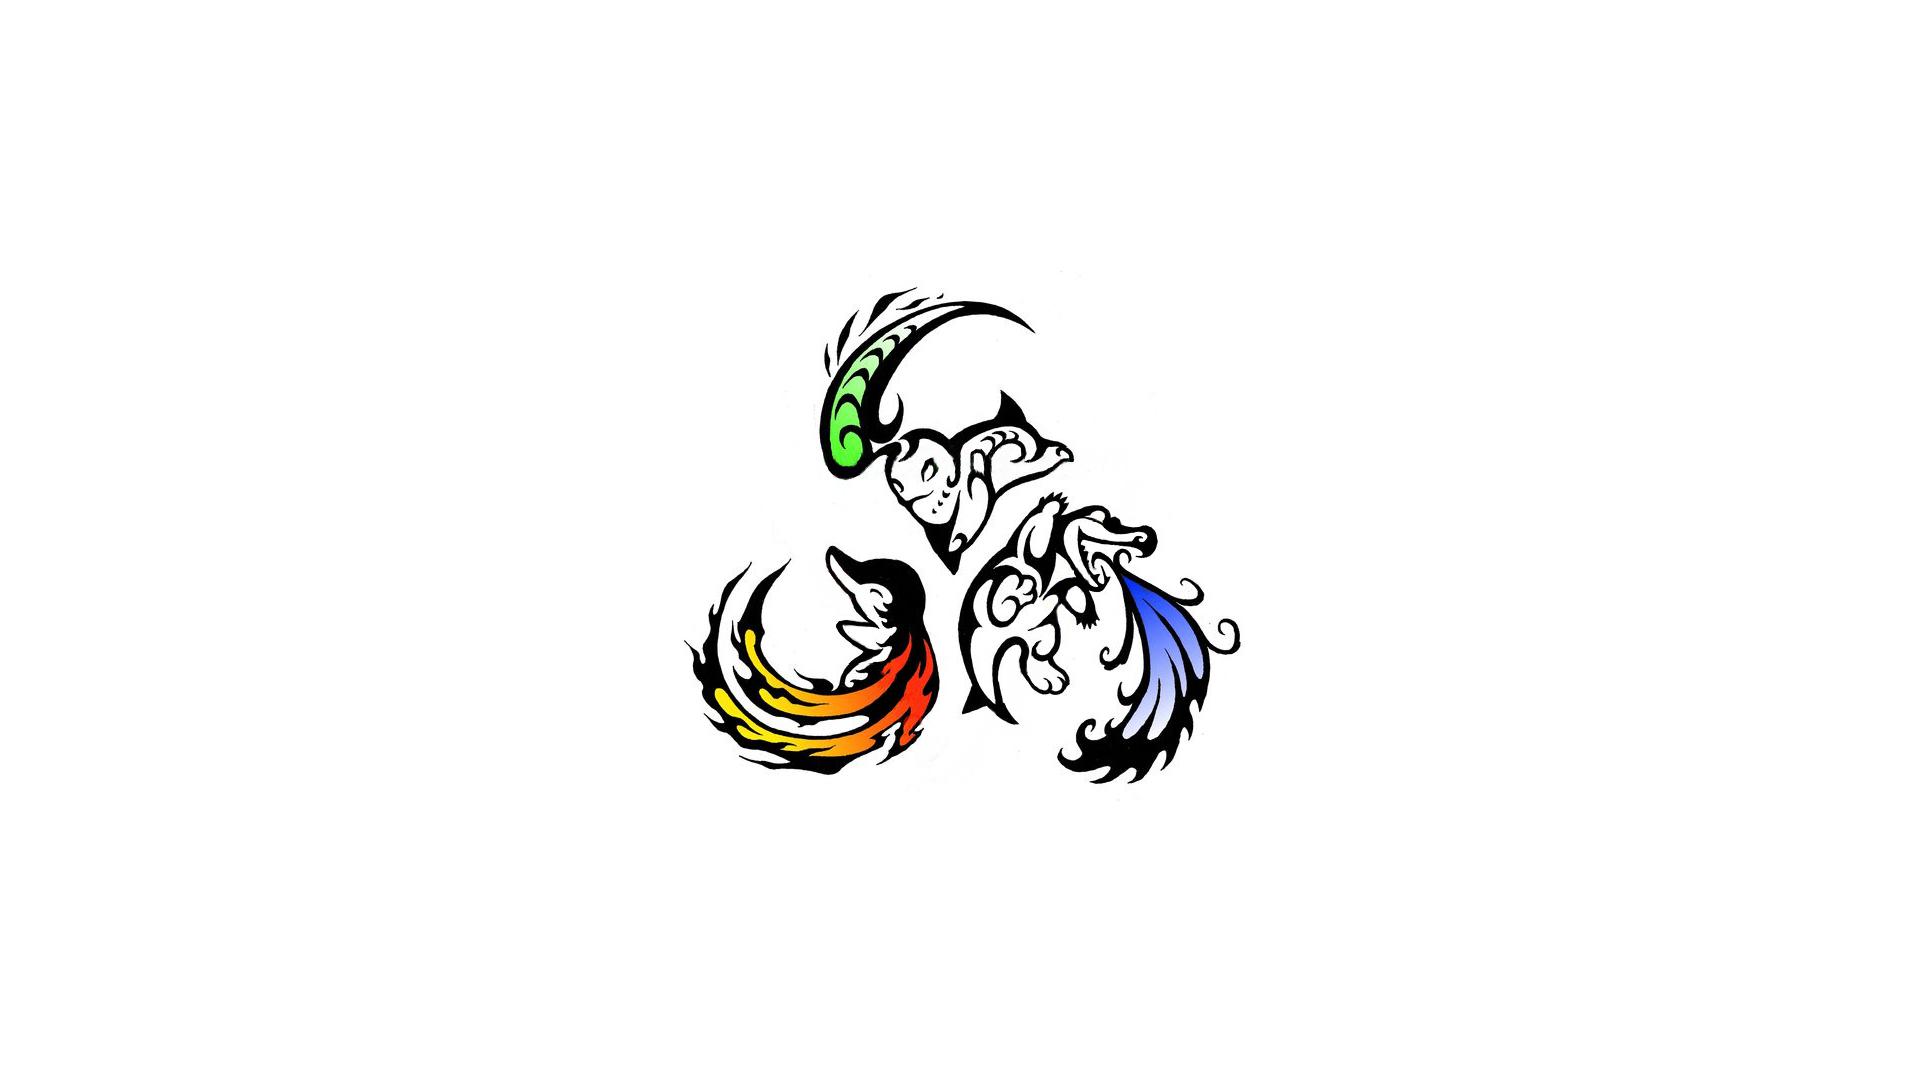 Pokemon Cyndaquil Chikorita Totodile